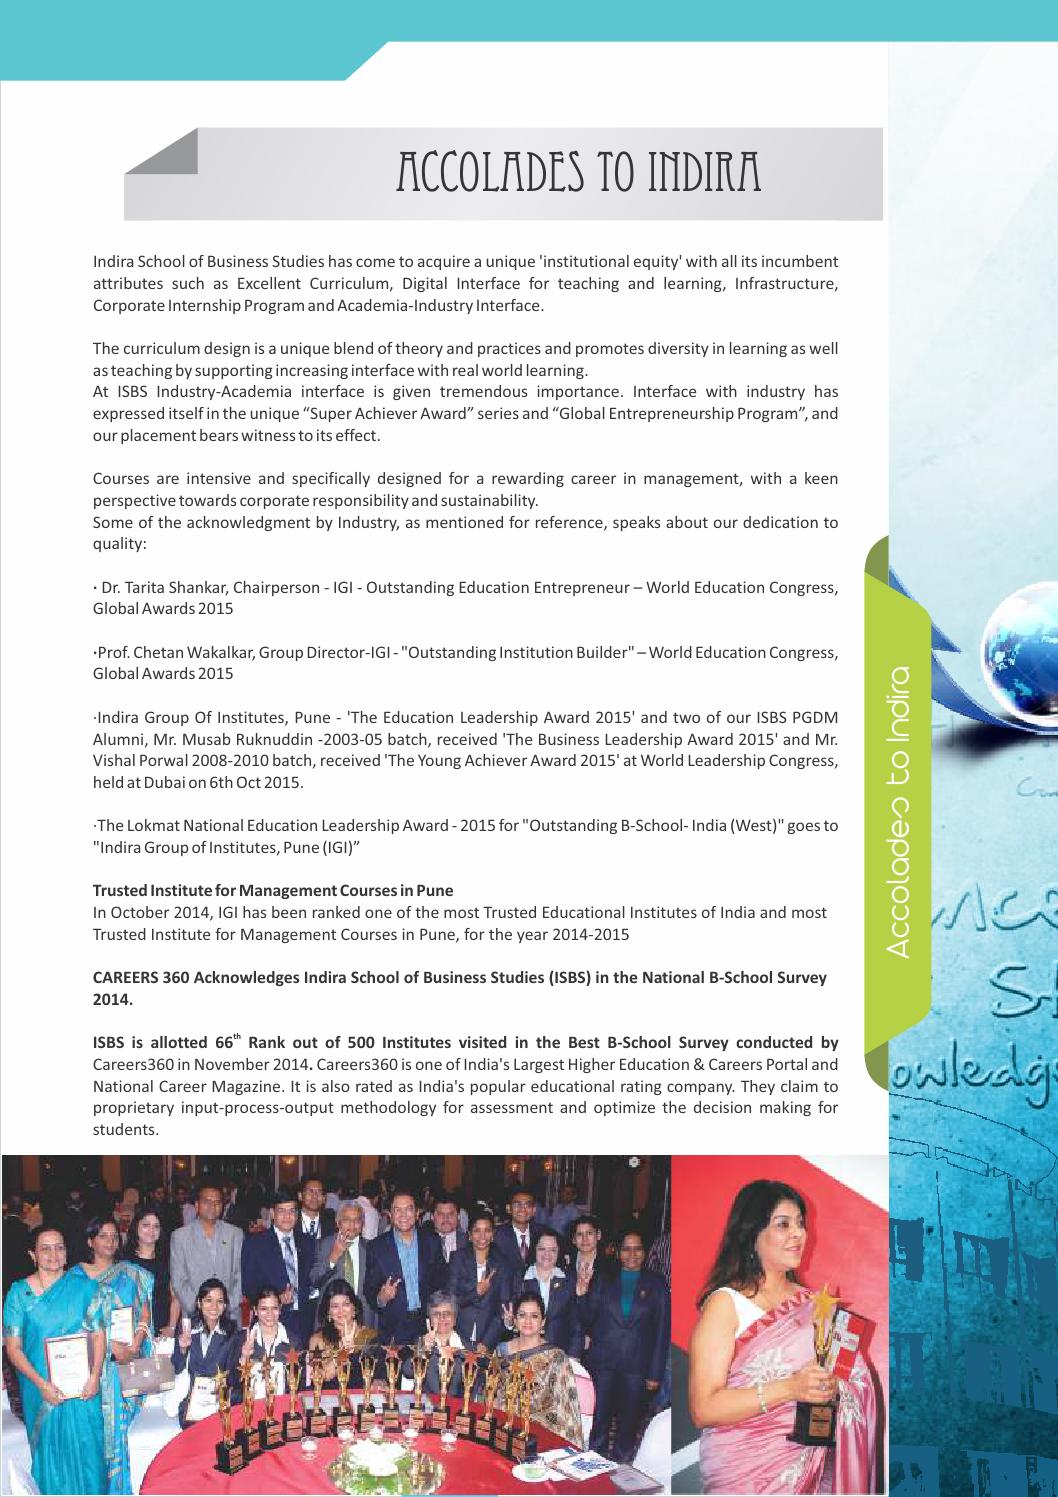 Indira School of Business Studies Prospectus 2016 by Indira Group of